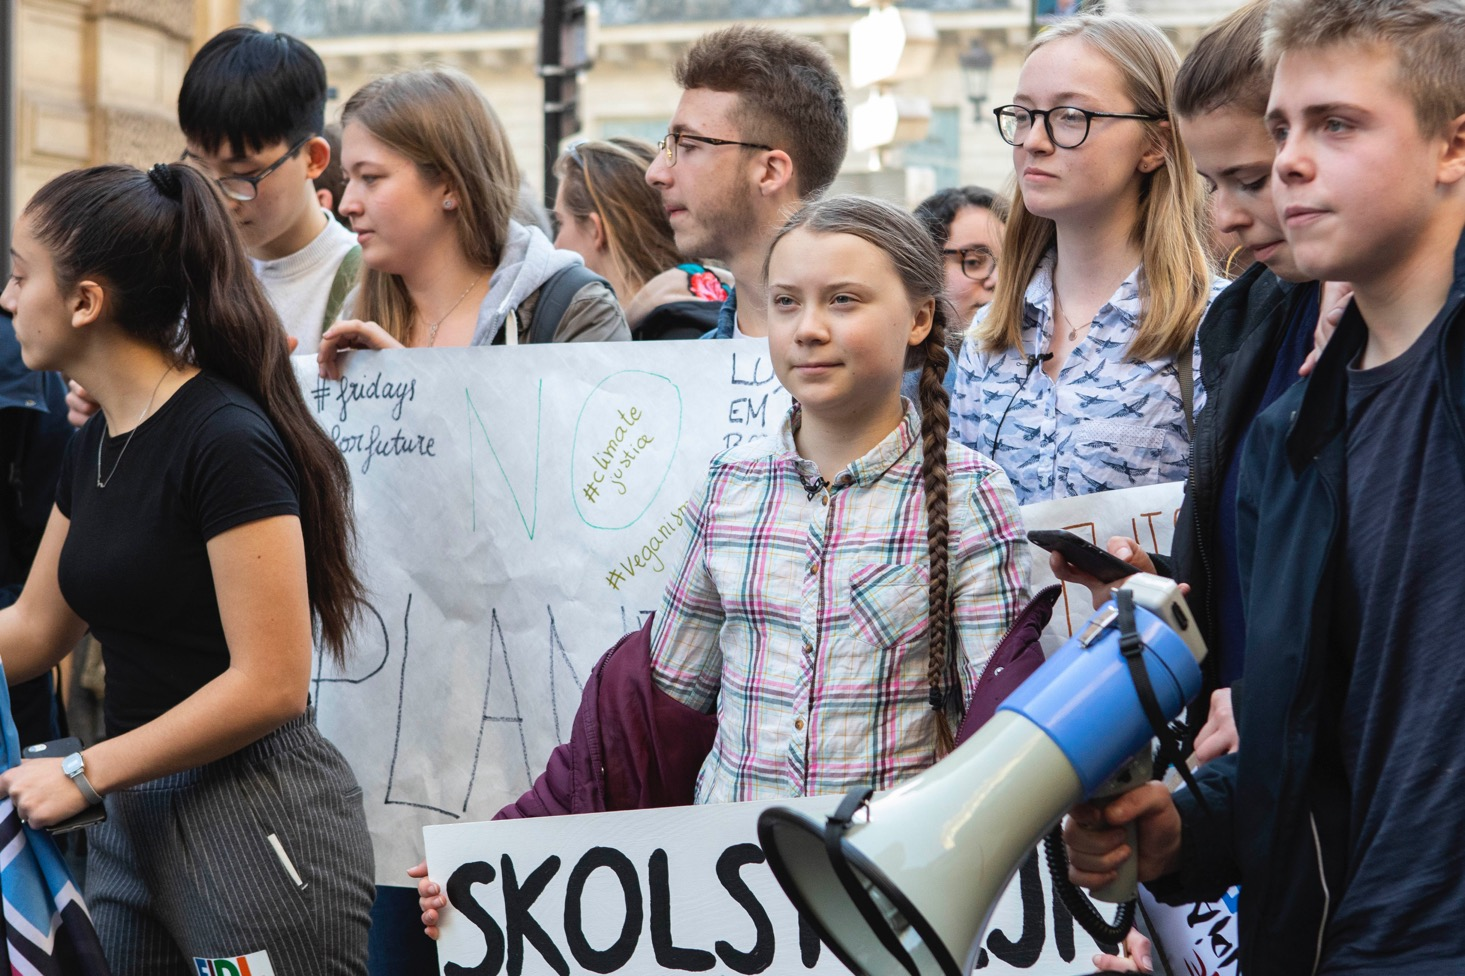 Greta Thunberg in Paris for climate demonstration